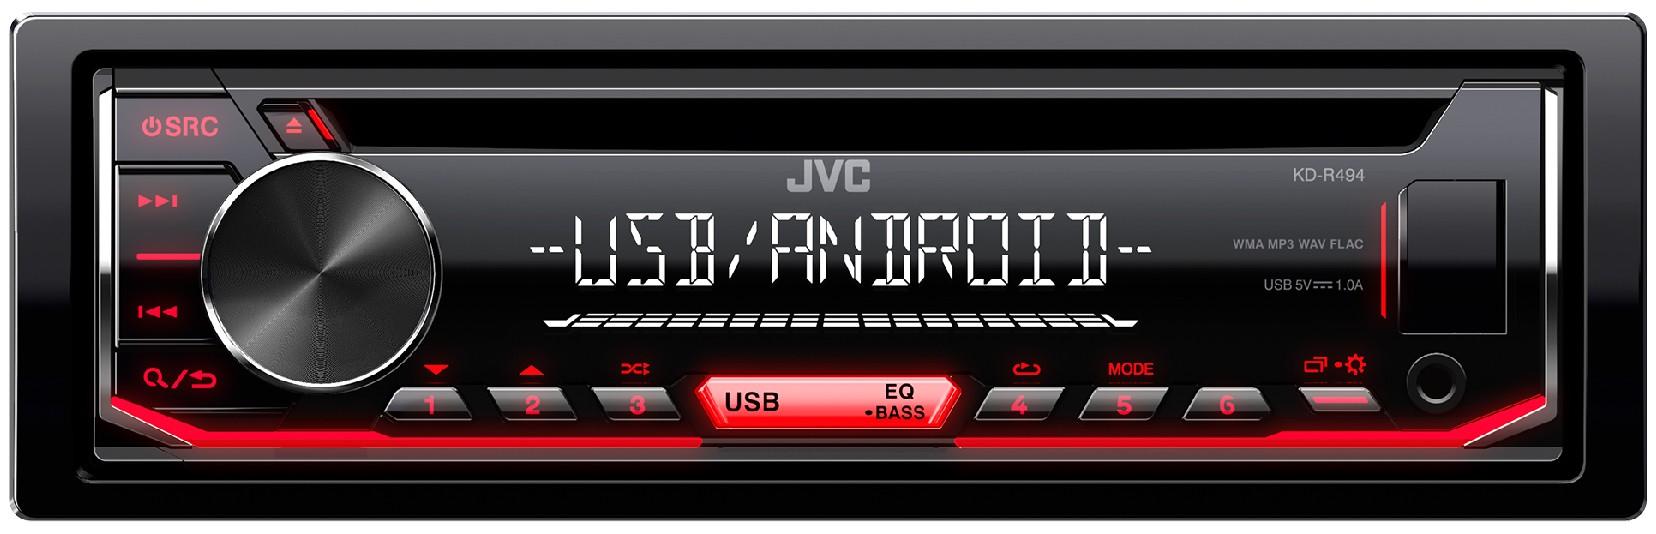 AUTORADIO JVC KD-R494